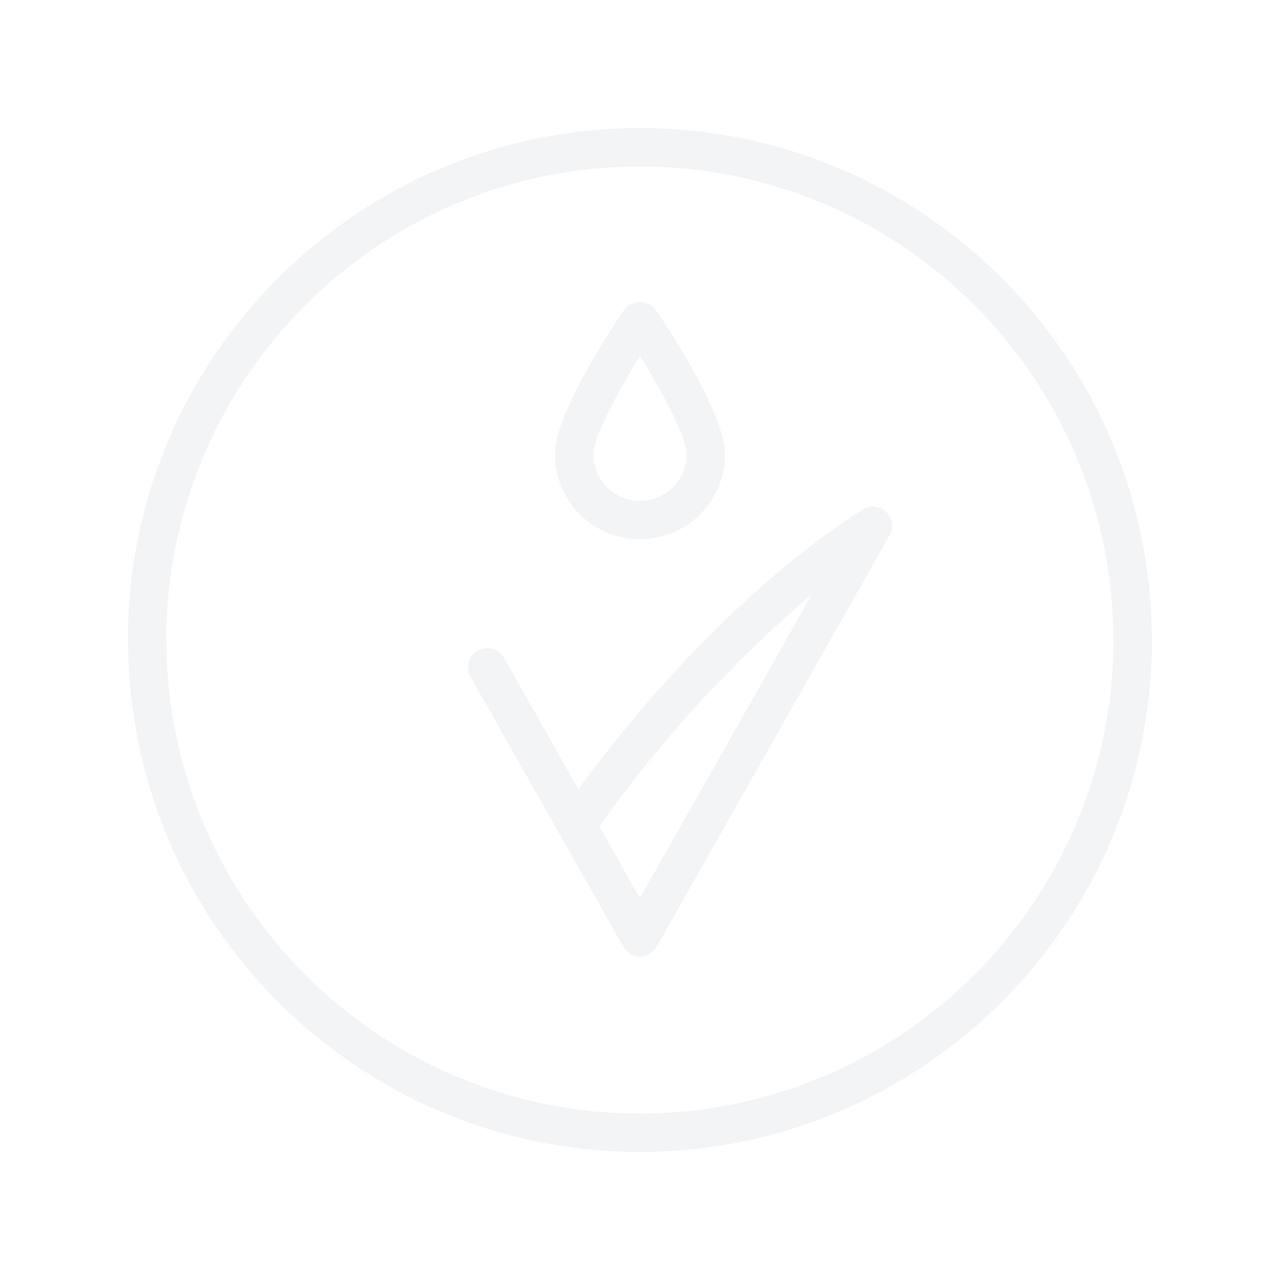 TAHE Lumiere Shampoo 250ml